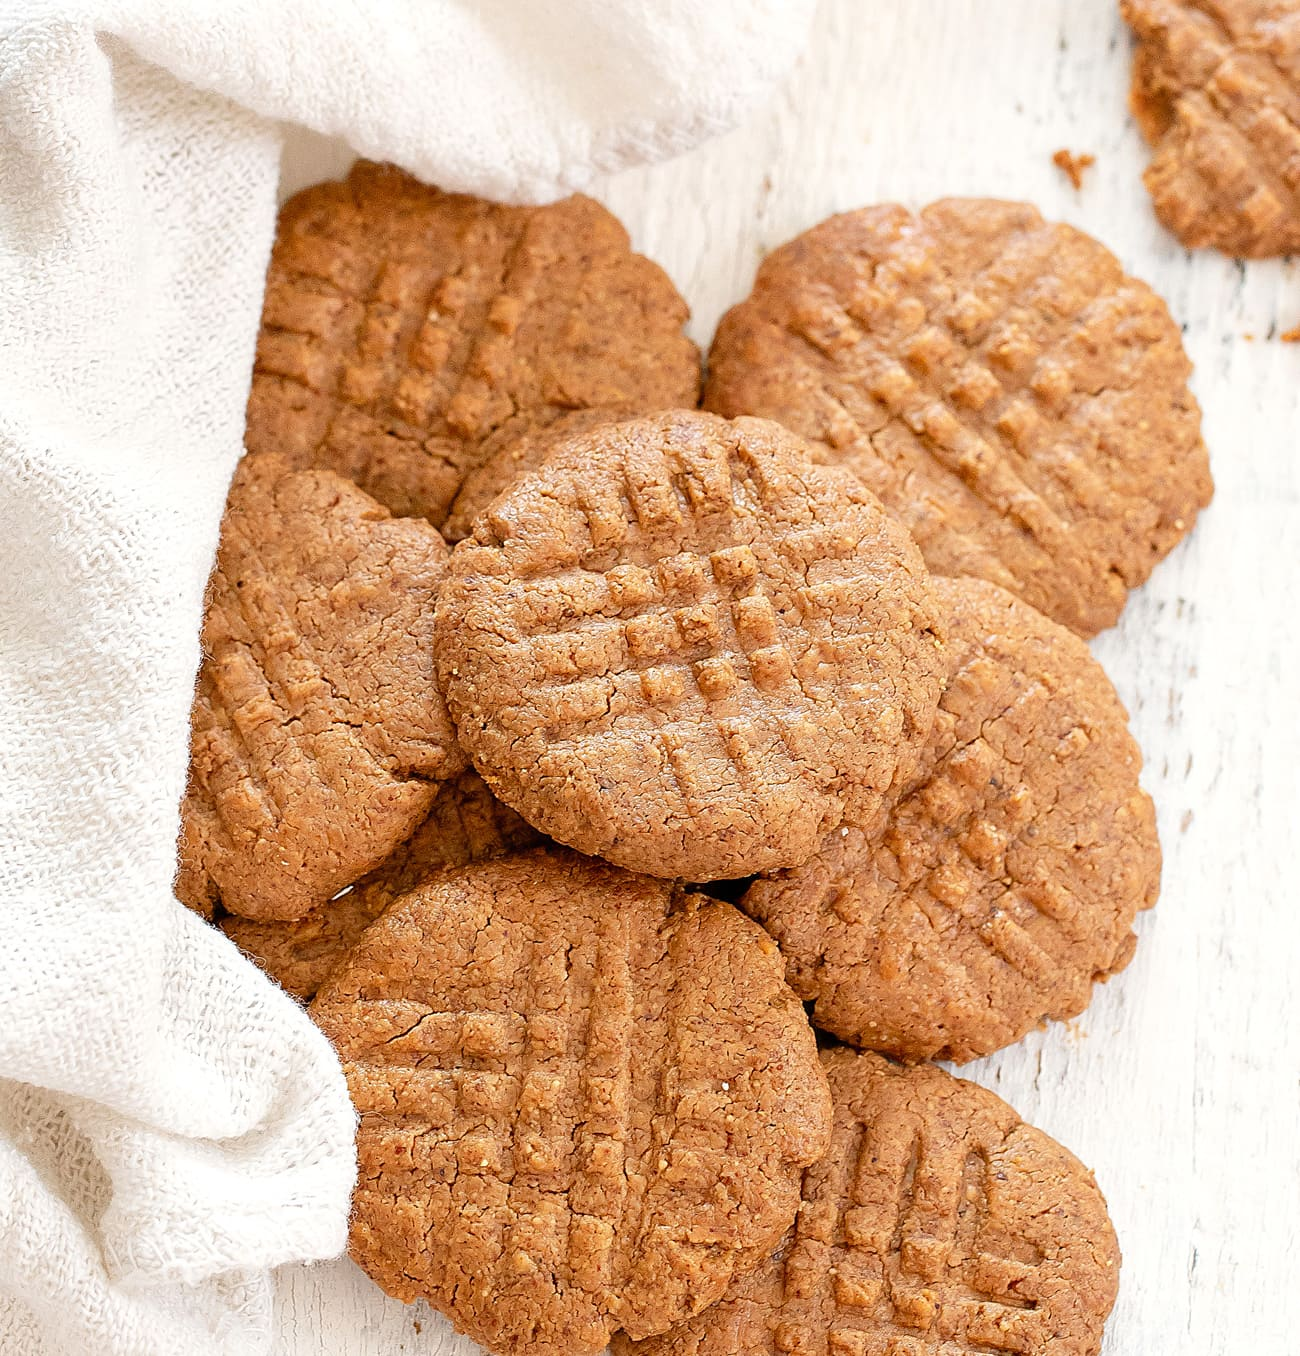 20 Ingredient Keto Almond Butter Cookies